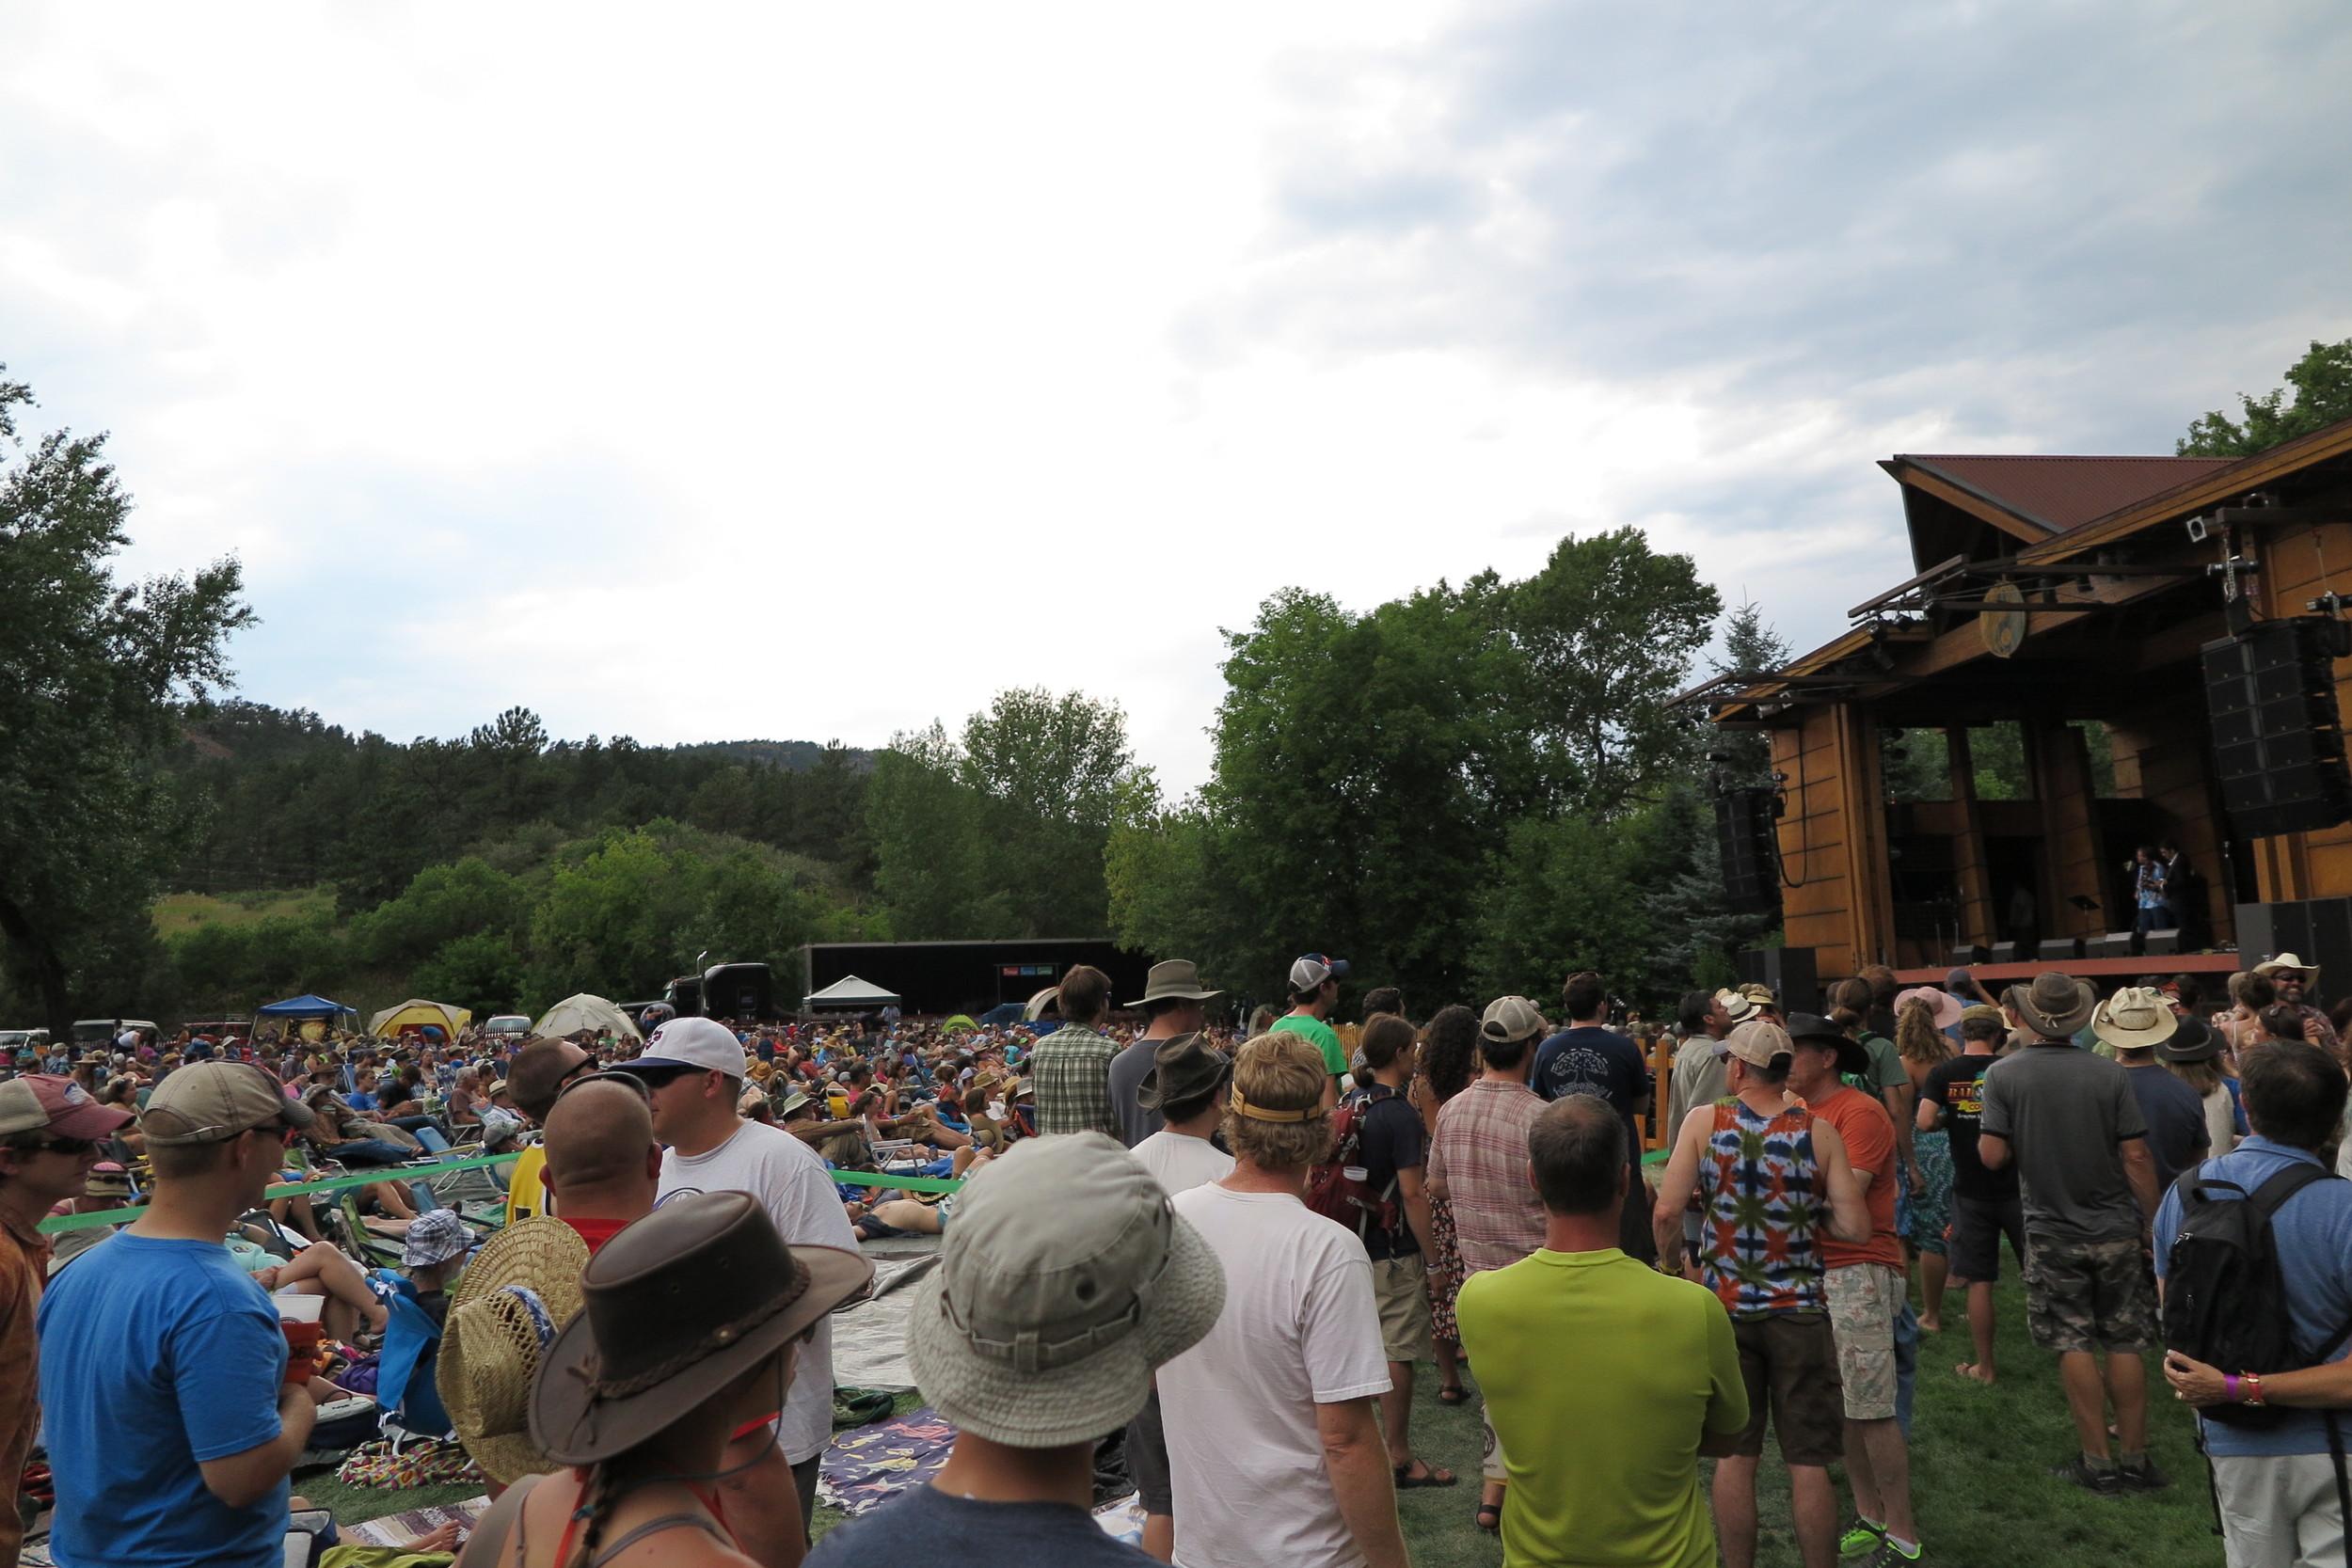 Crowd Main Stage Area-1.JPG